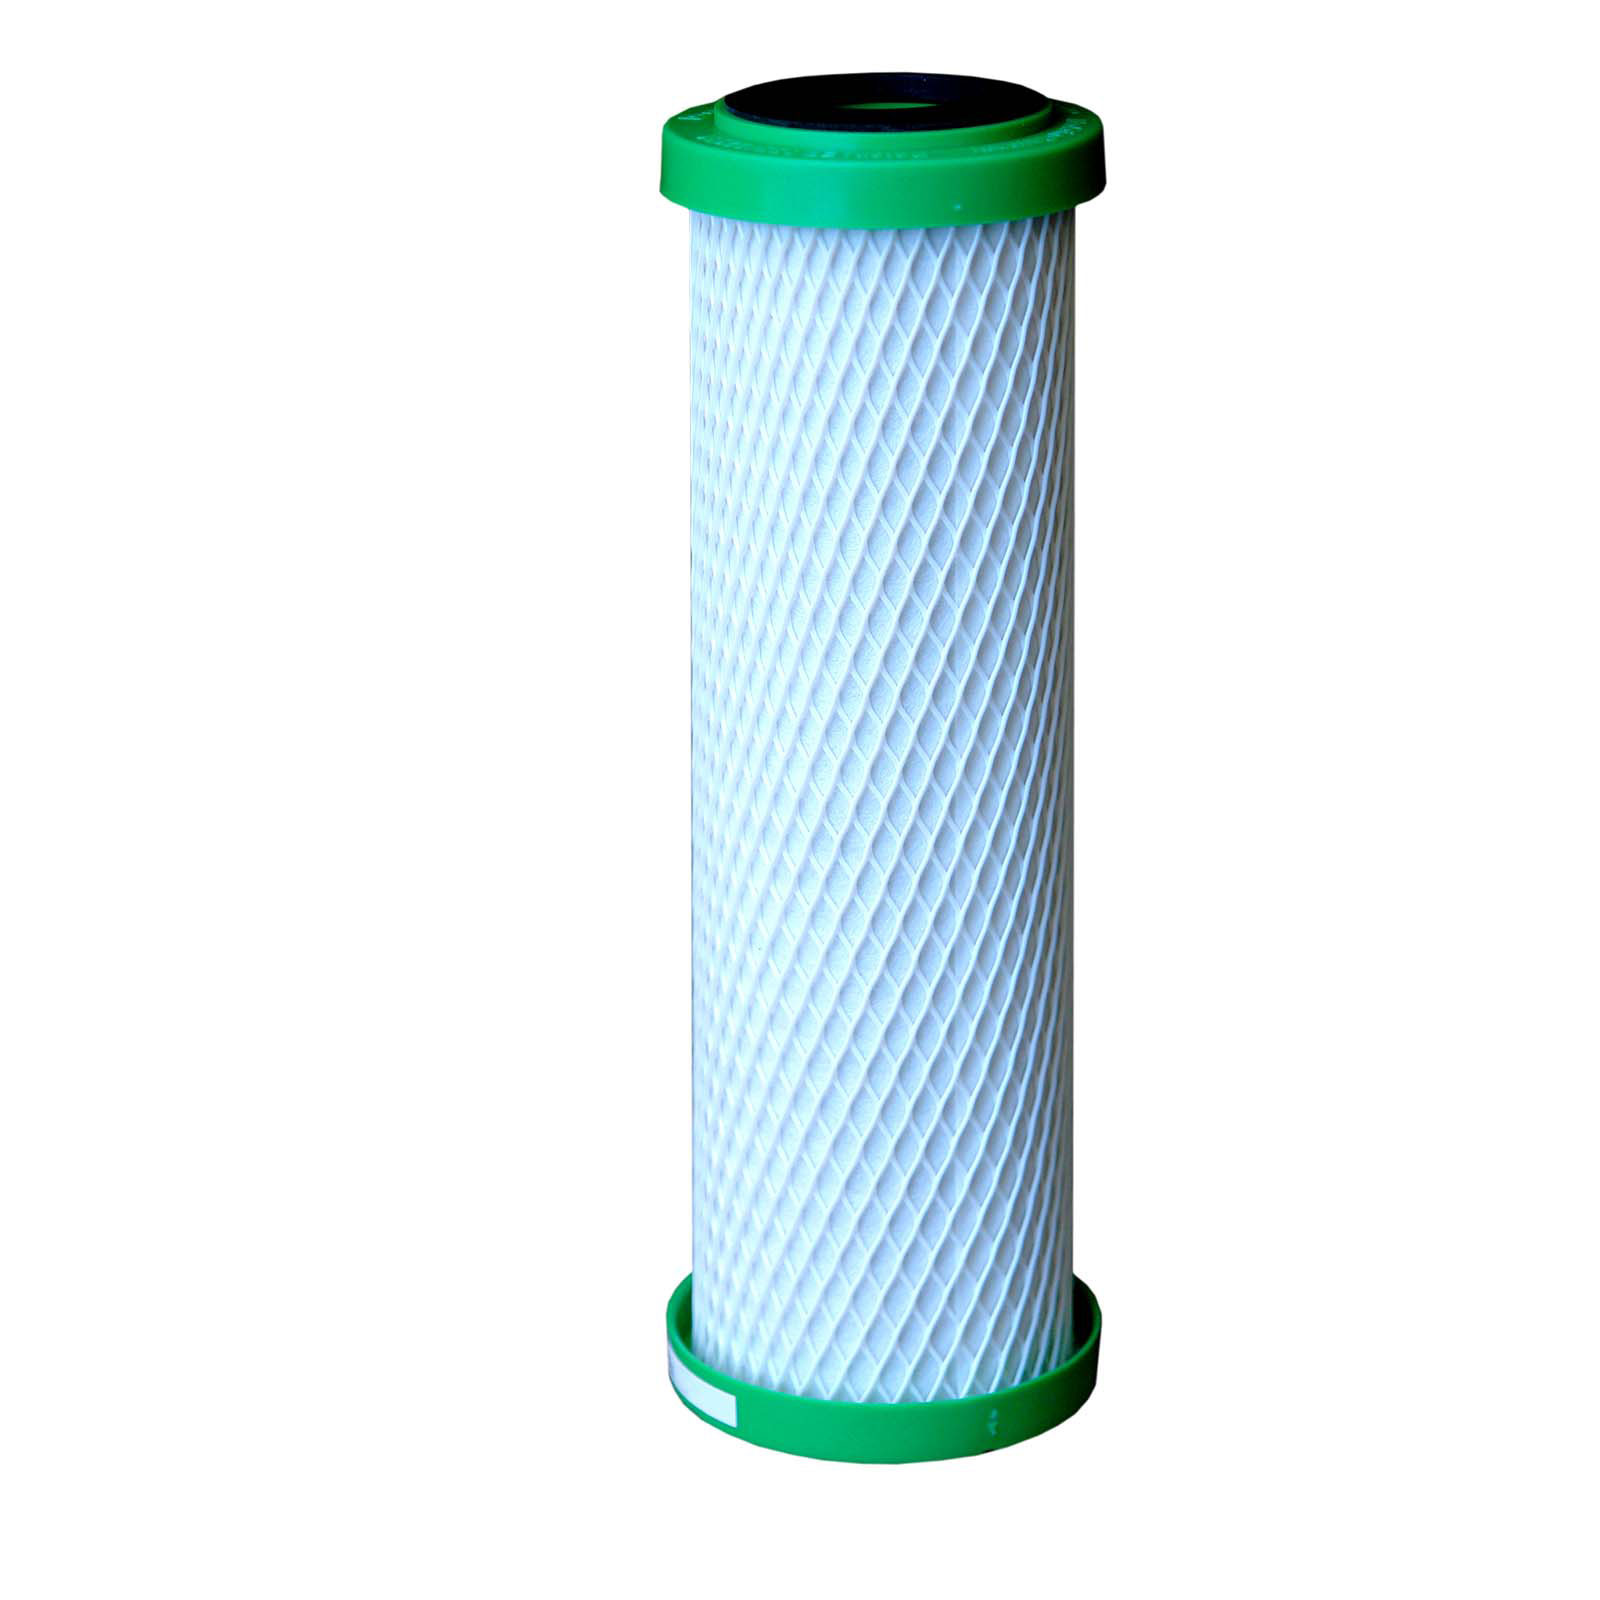 NFP-4,5 -9 Carbonit Ersatzfilter Wasserfilter